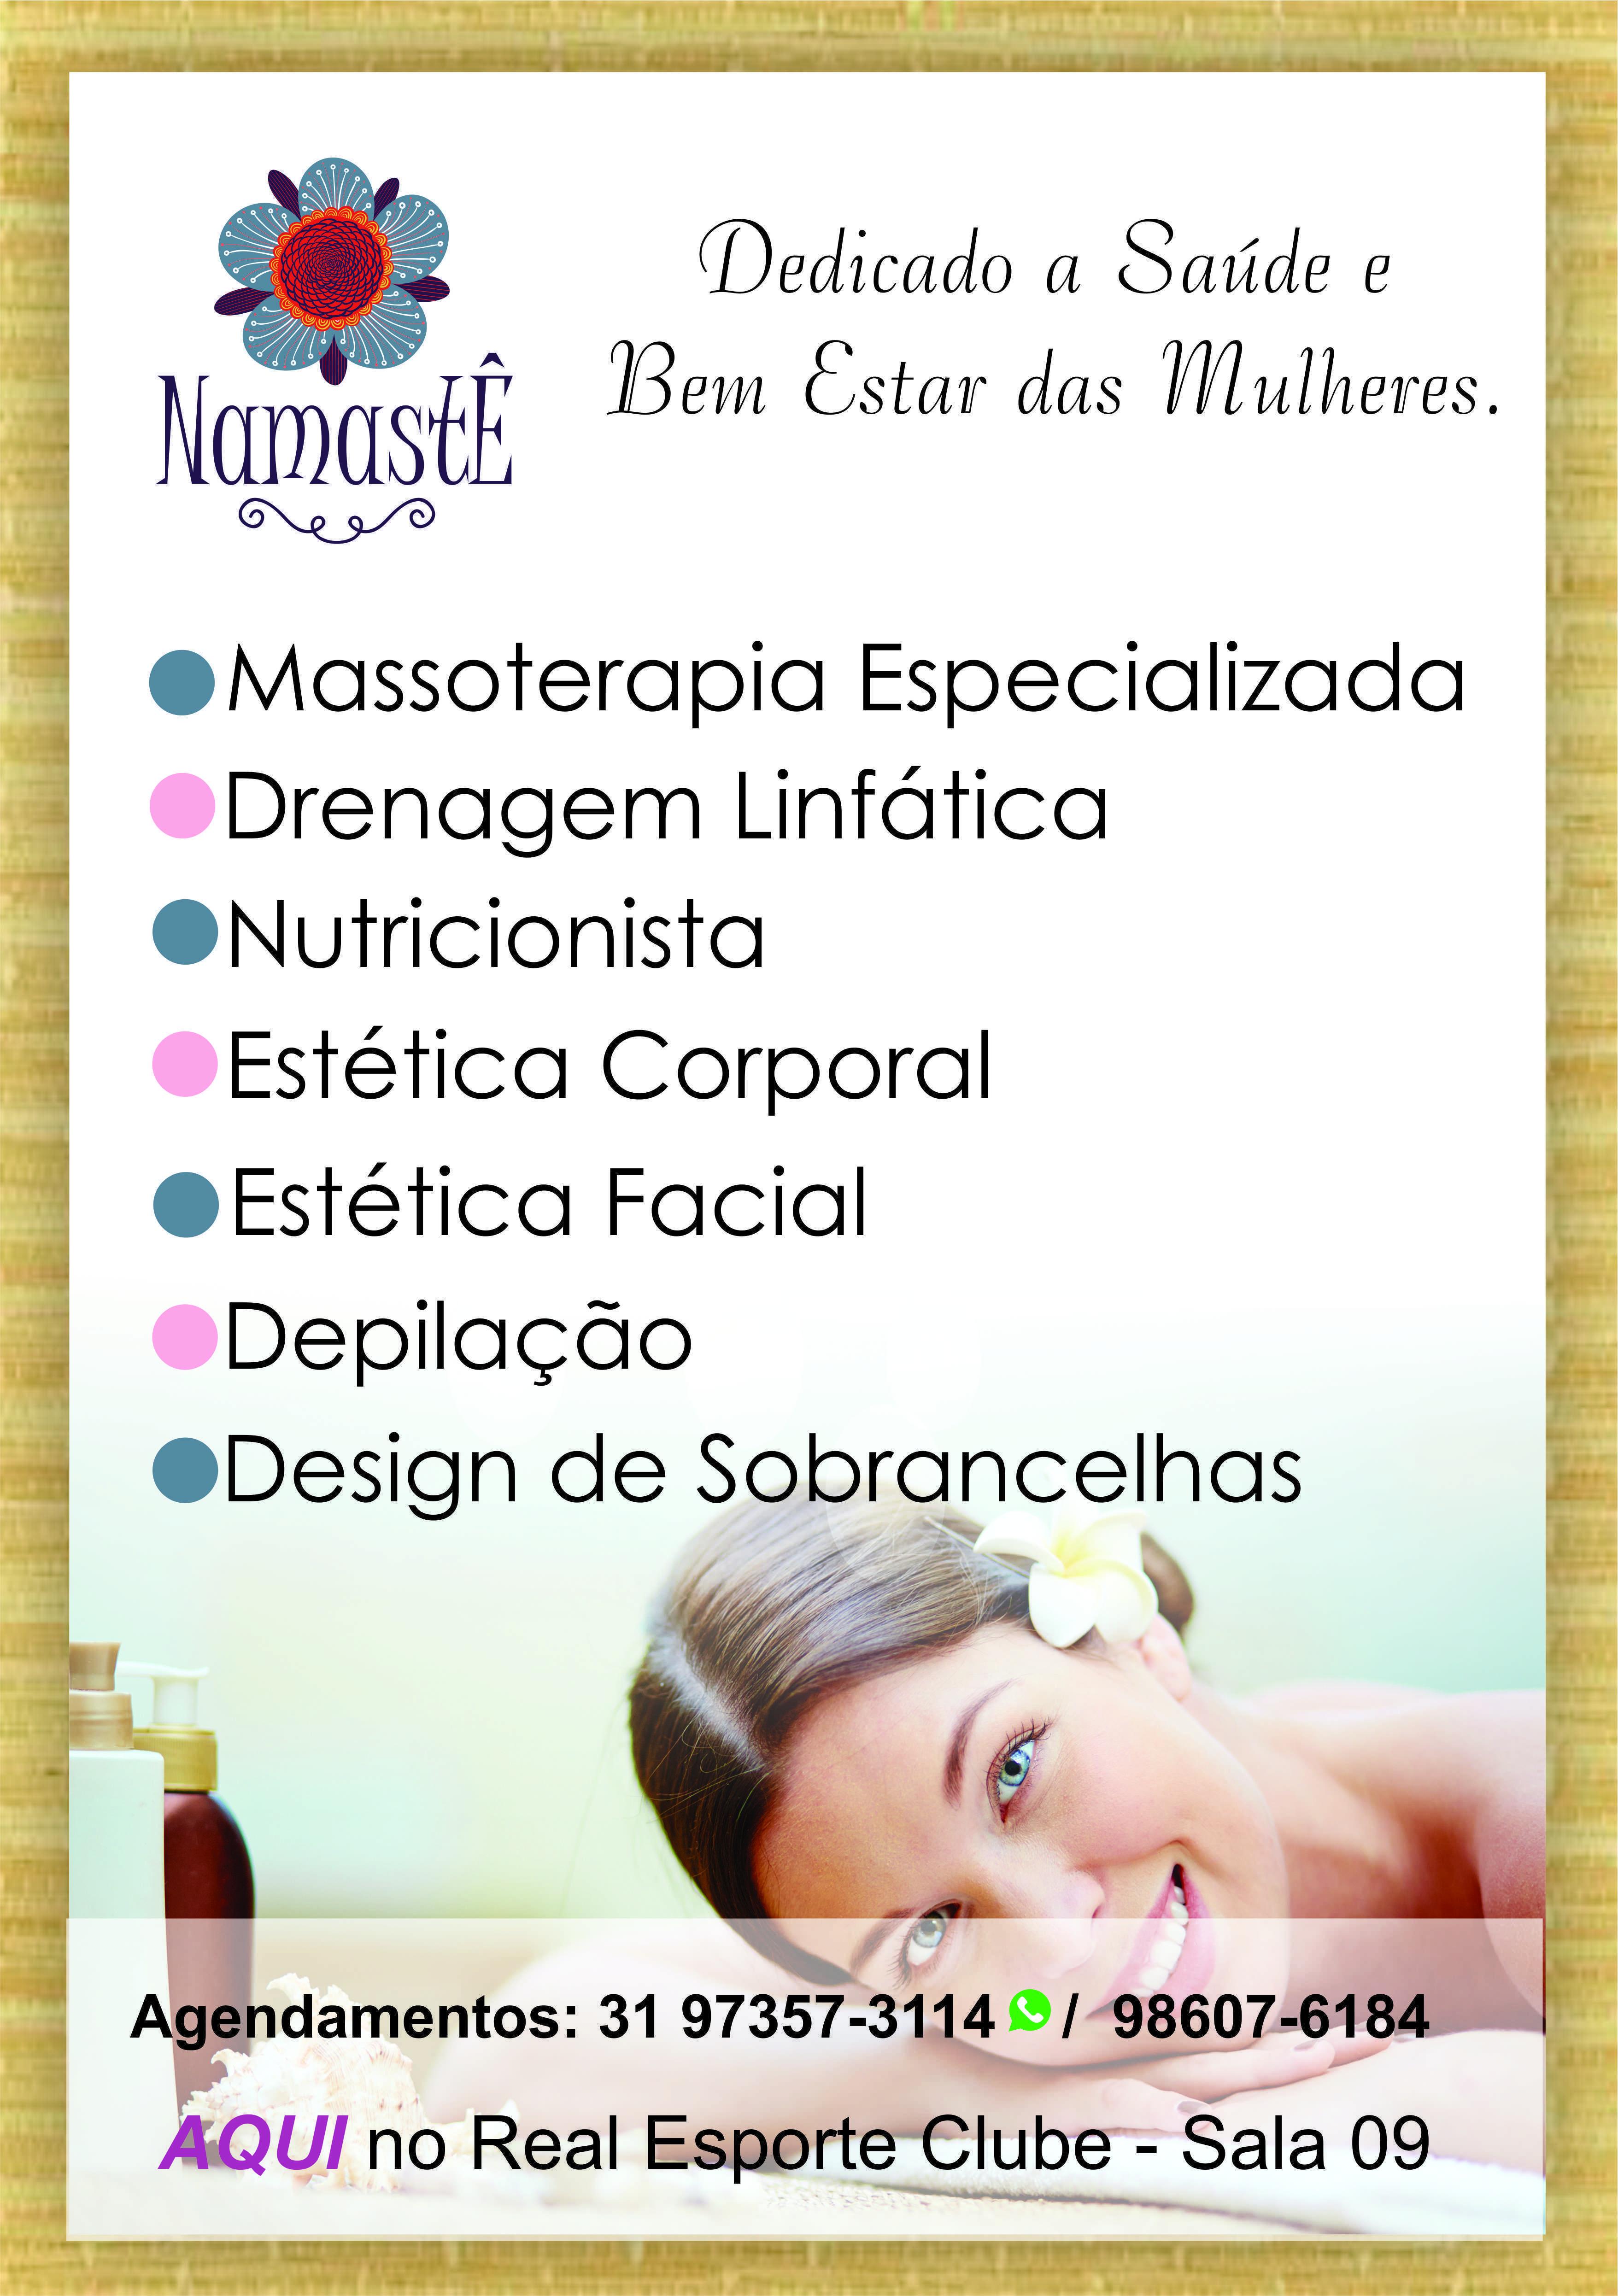 #spaurbano outros massagista terapeuta enfermeiro(a) esteticista